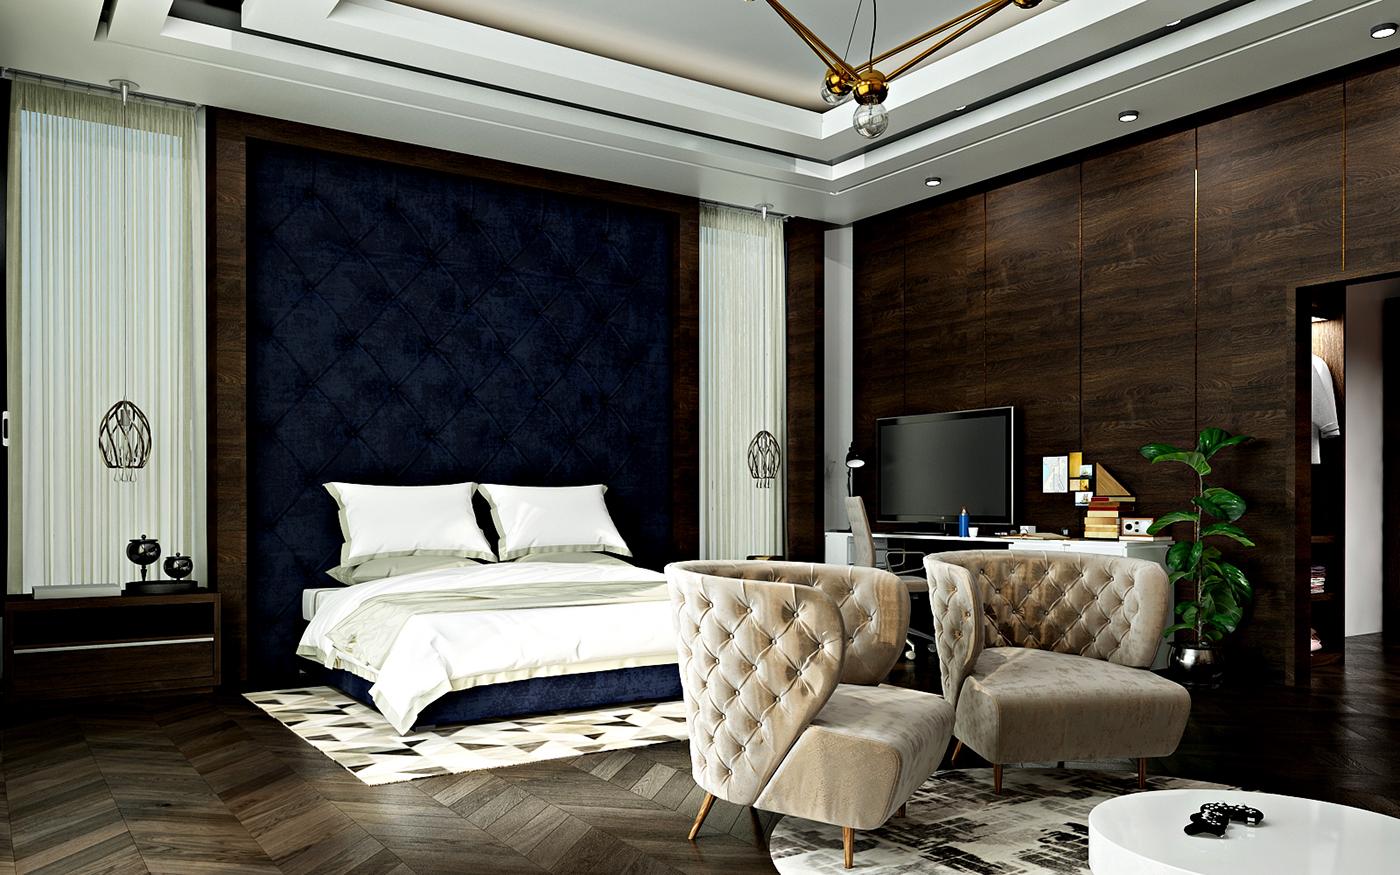 Luxury Boy's bedroom interior design in Kuwait on Behance